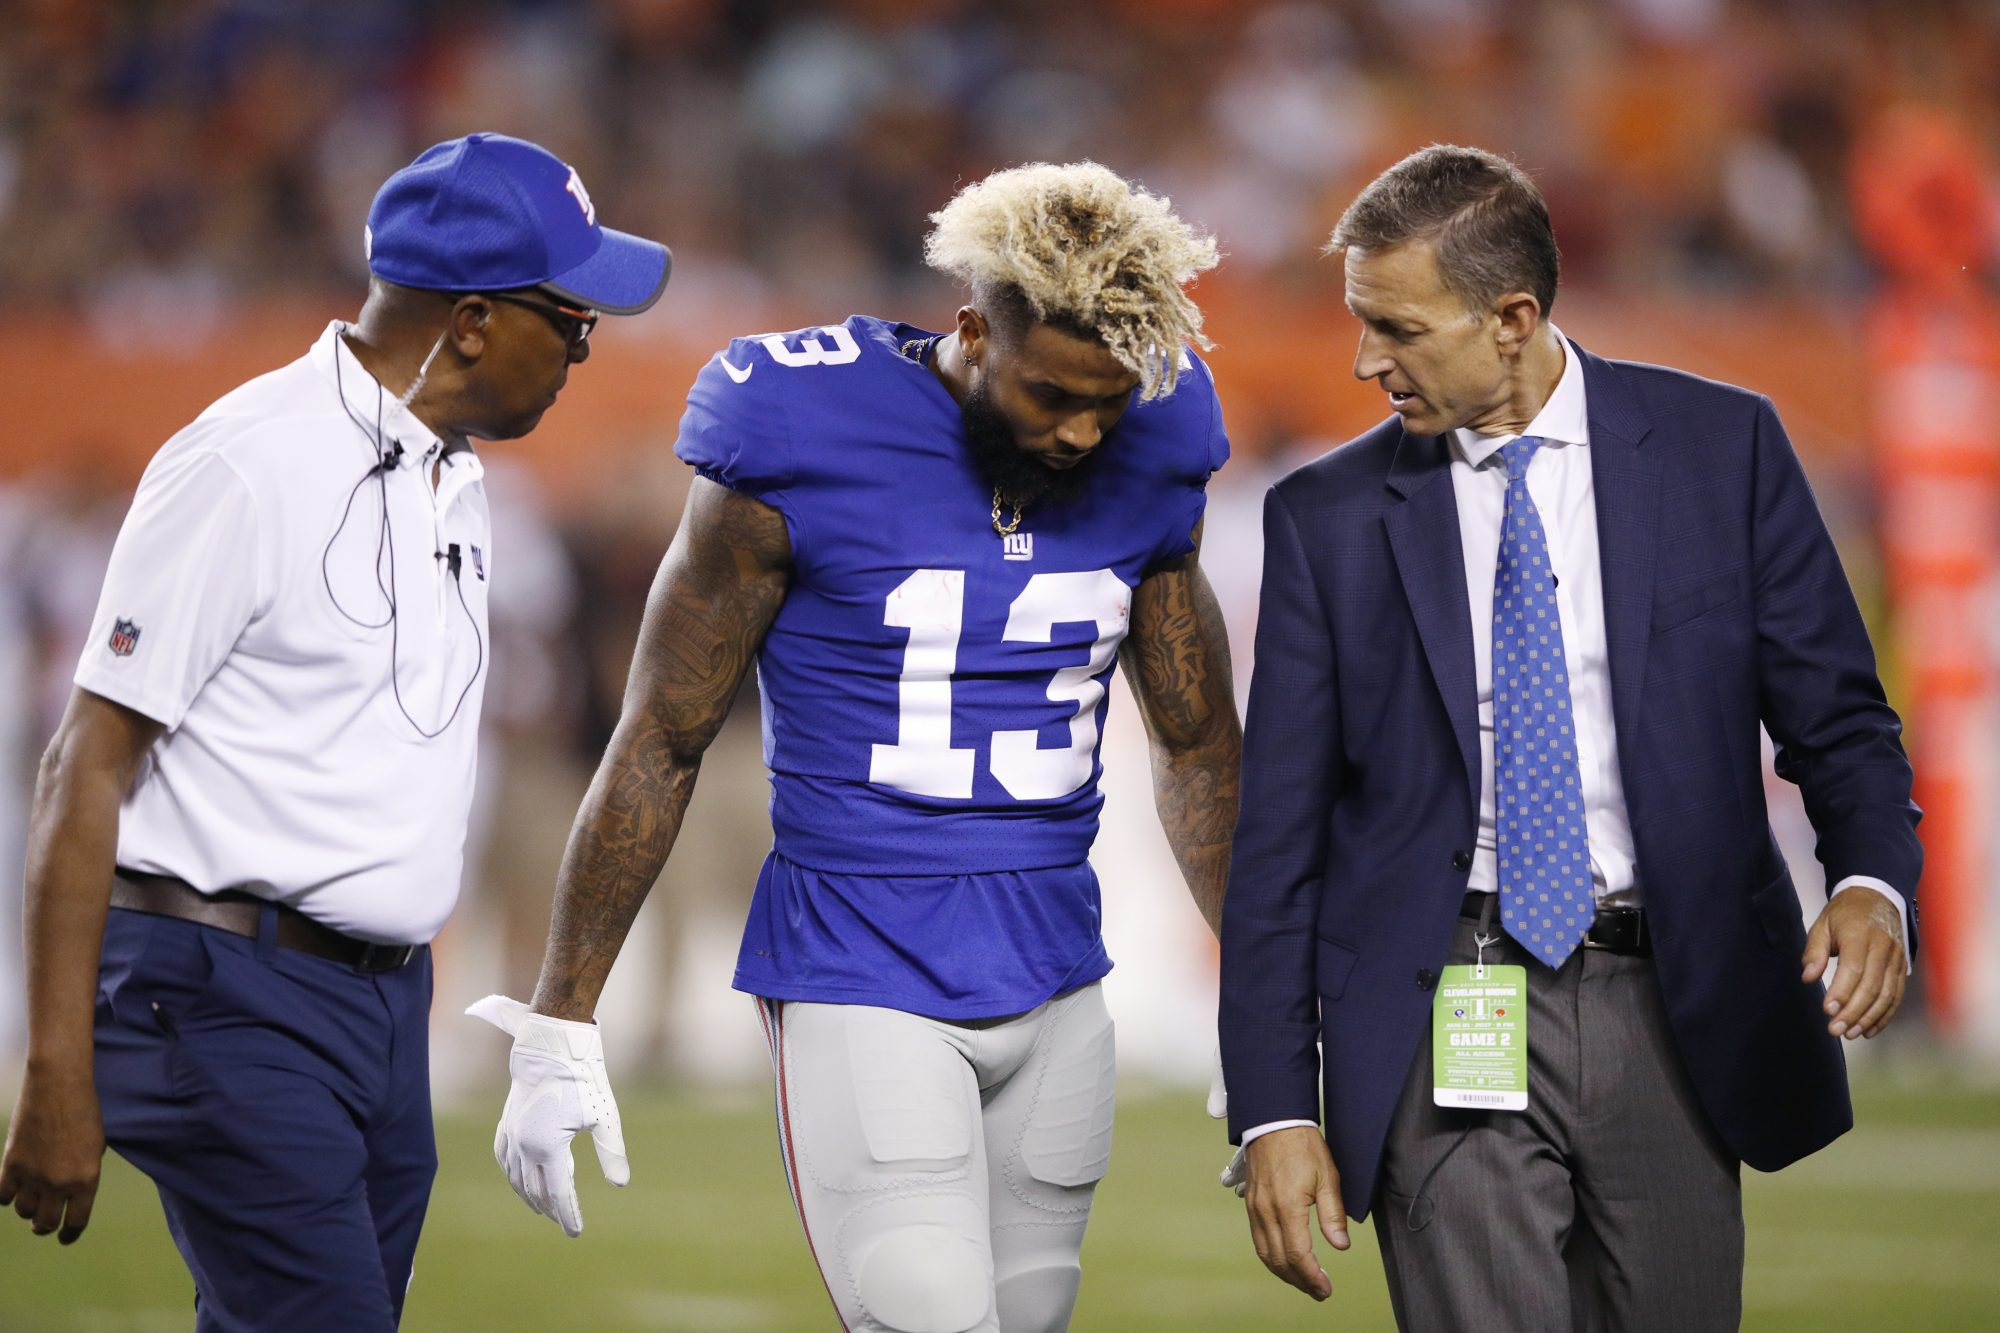 New York Giants Preseason Week 2: O-Line Pathetic Again, Odell Beckham Jr. Injured (Highlights)